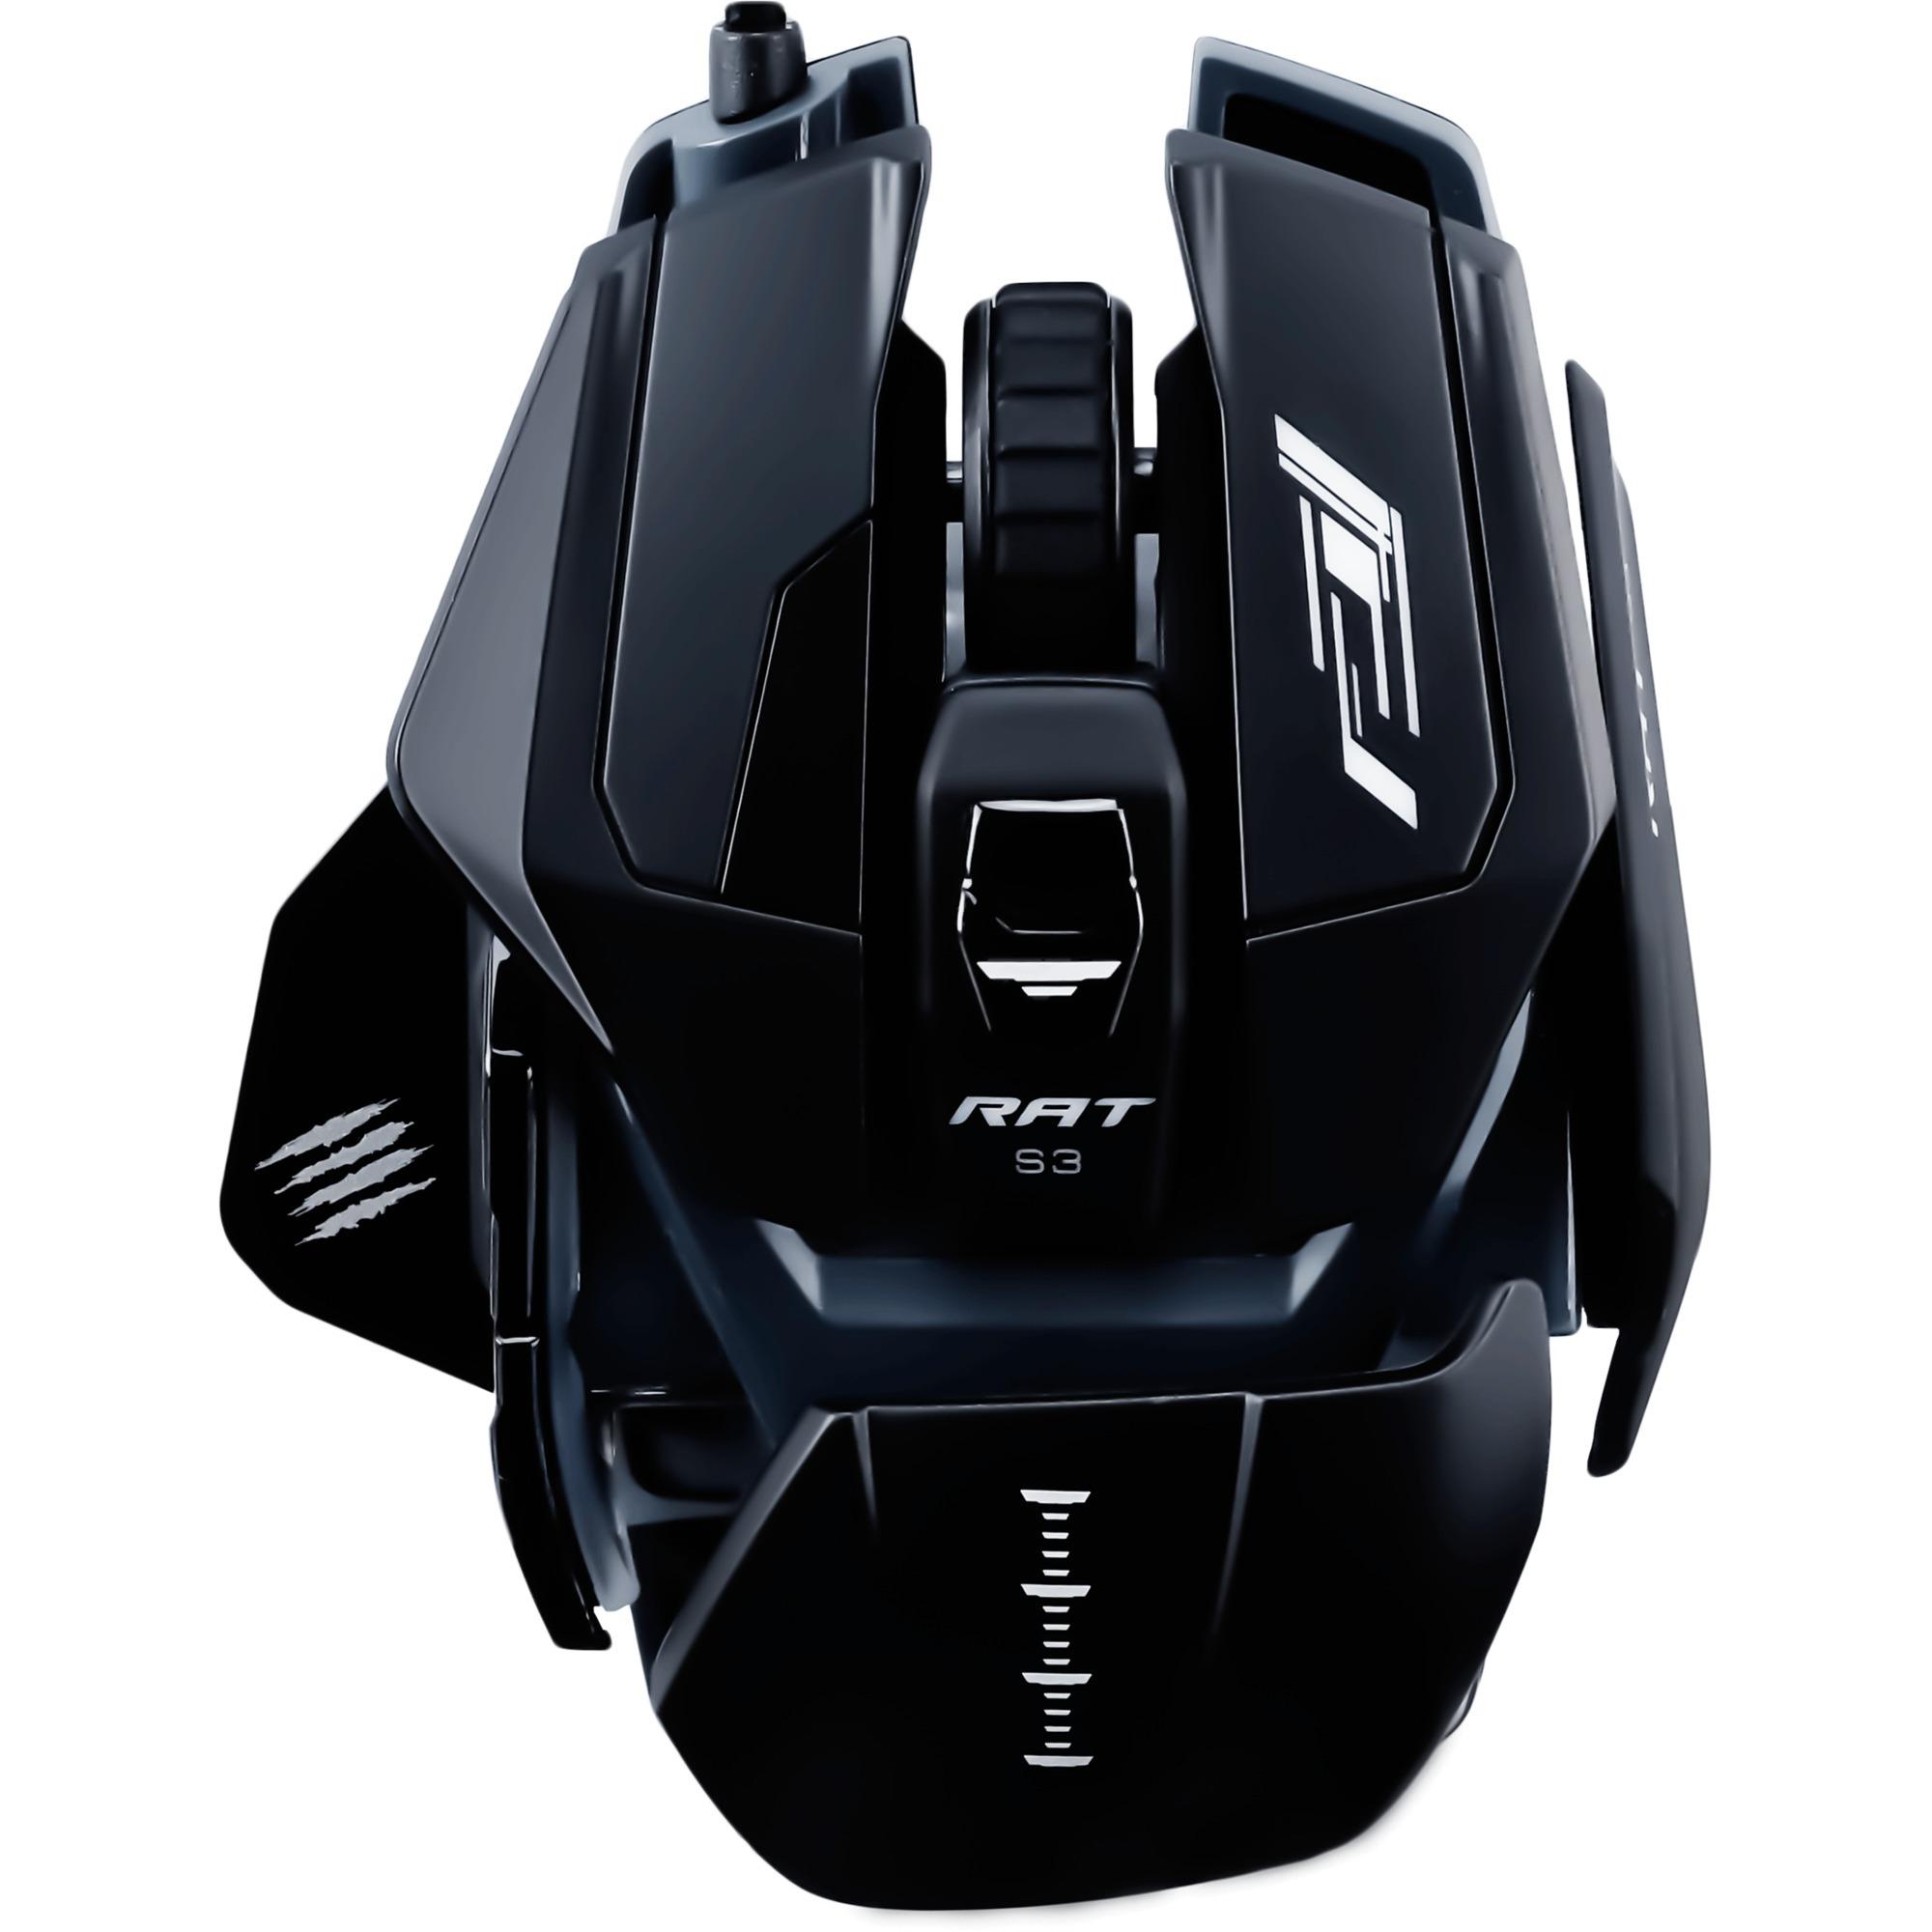 R.A.T. Pro S3 ratón USB Óptico 7200 DPI mano derecha